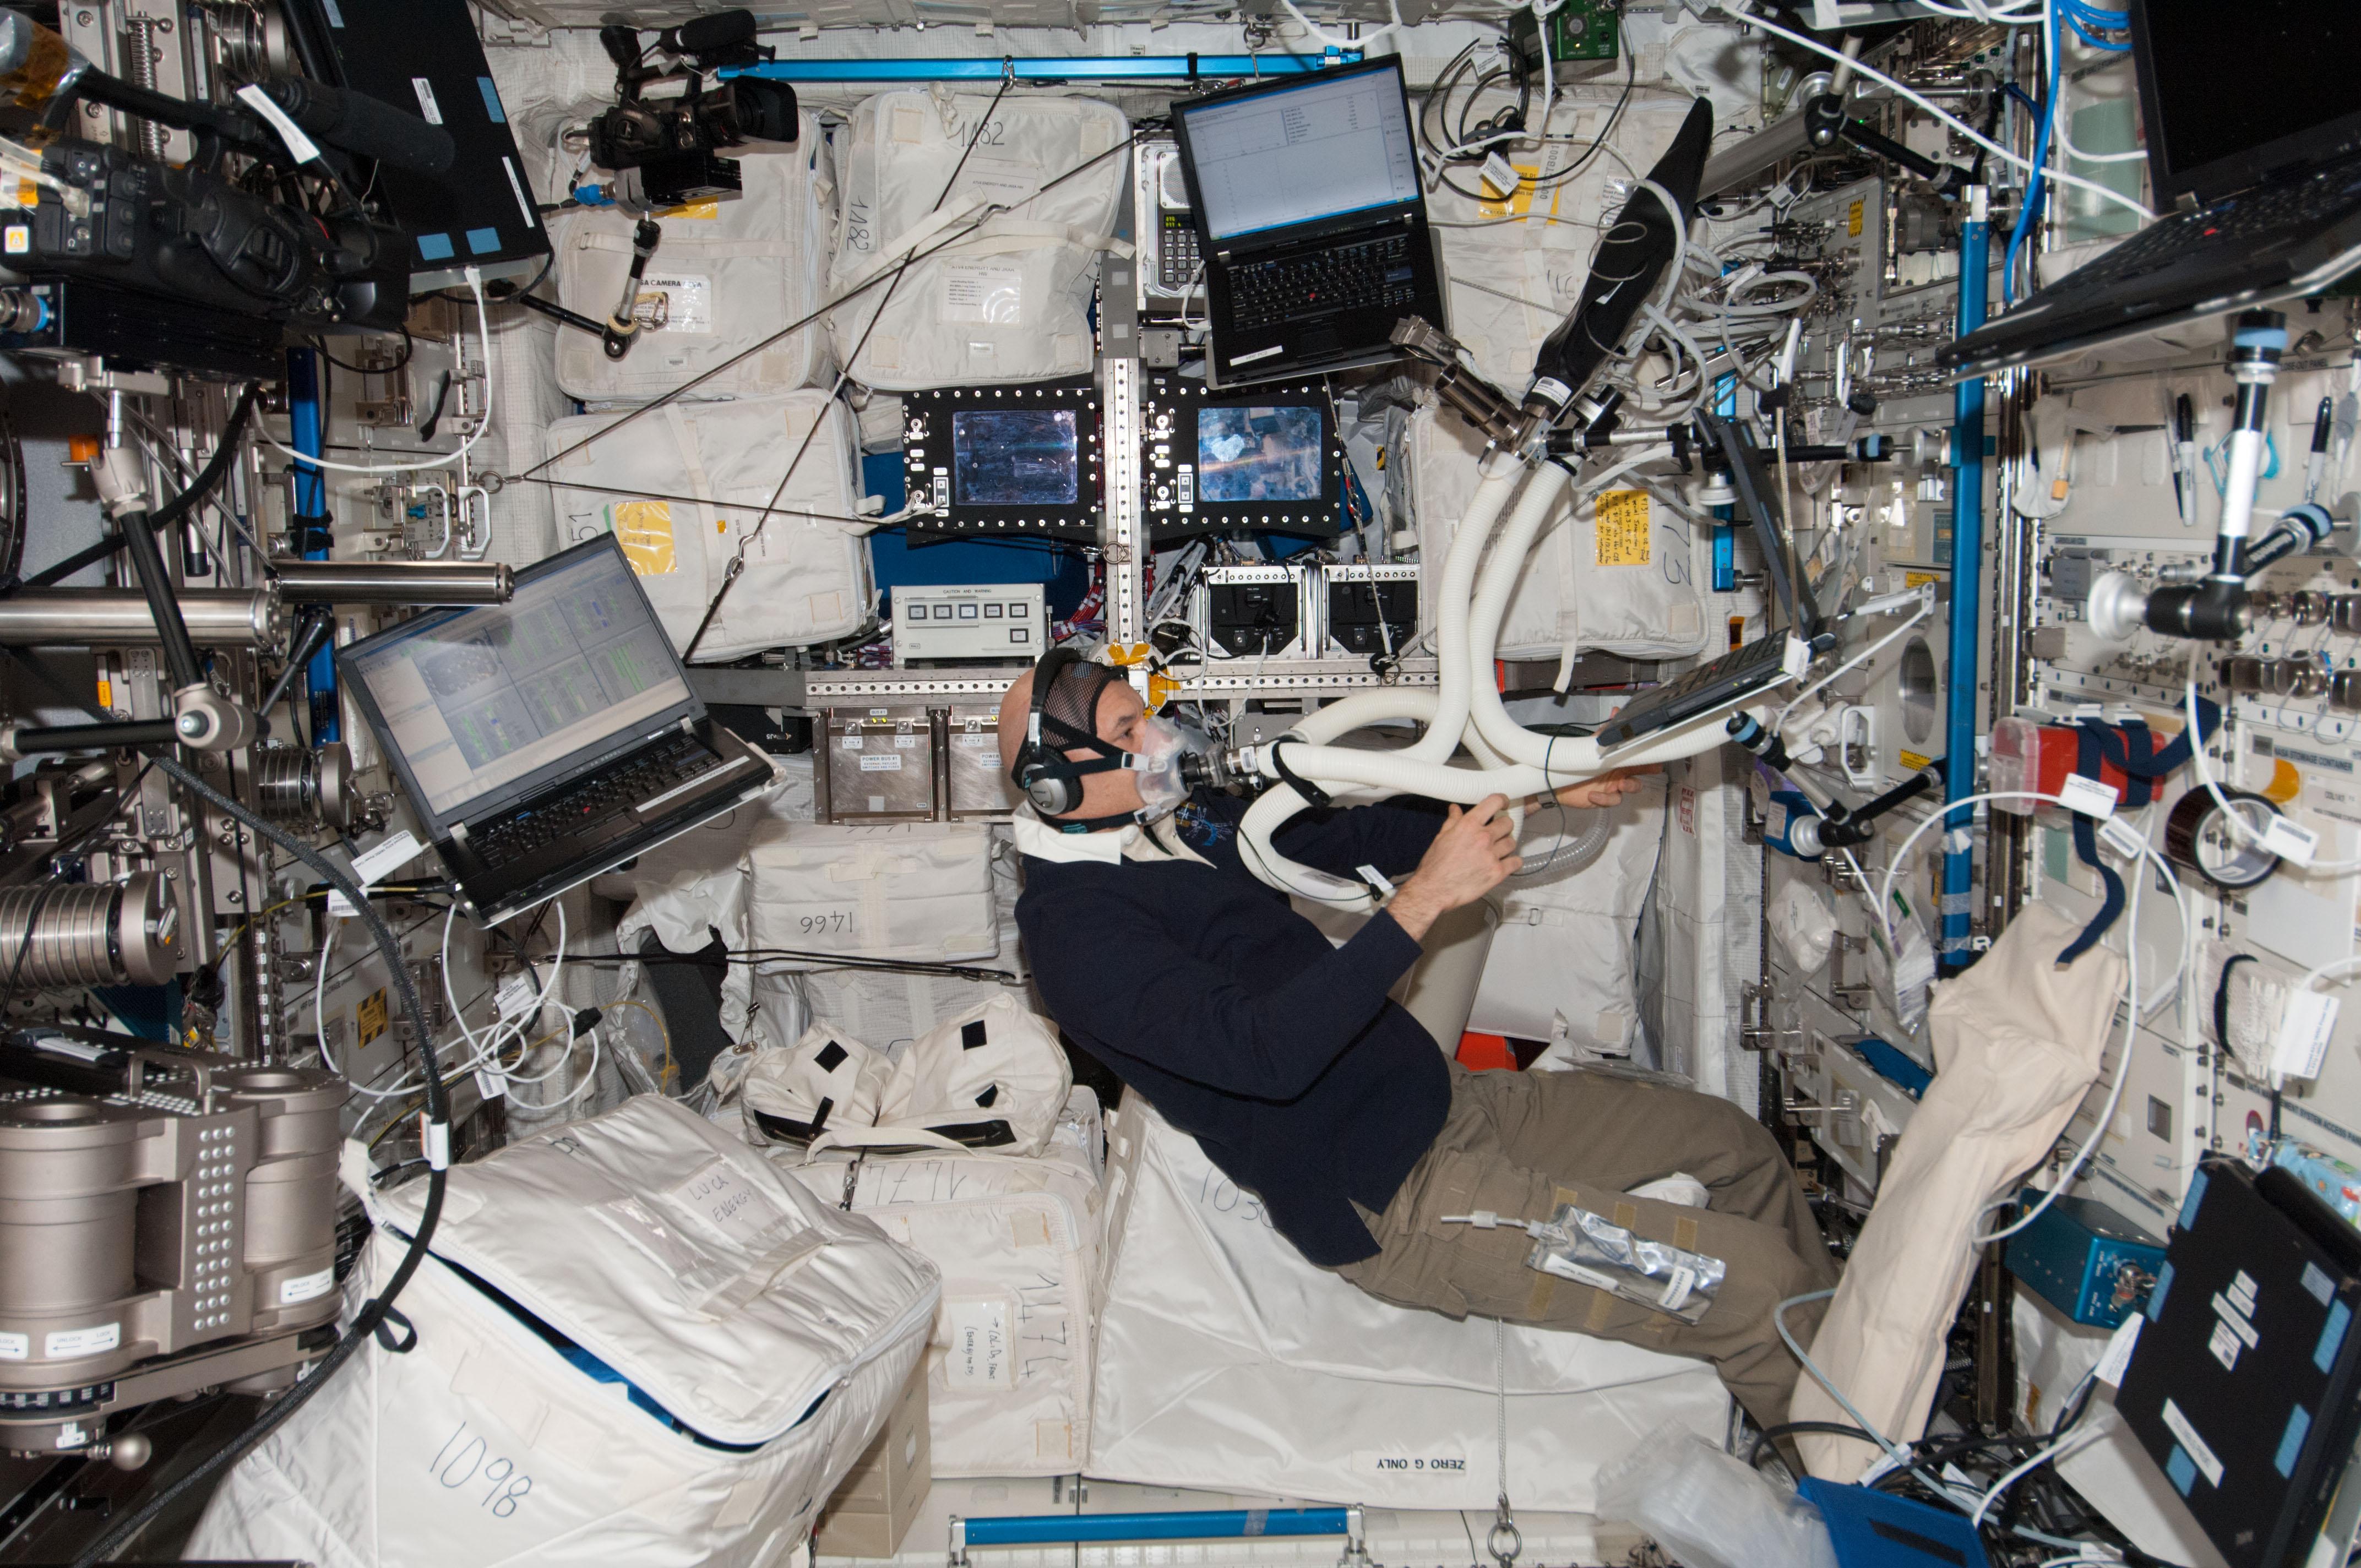 european space agency astronaut jobs - photo #20